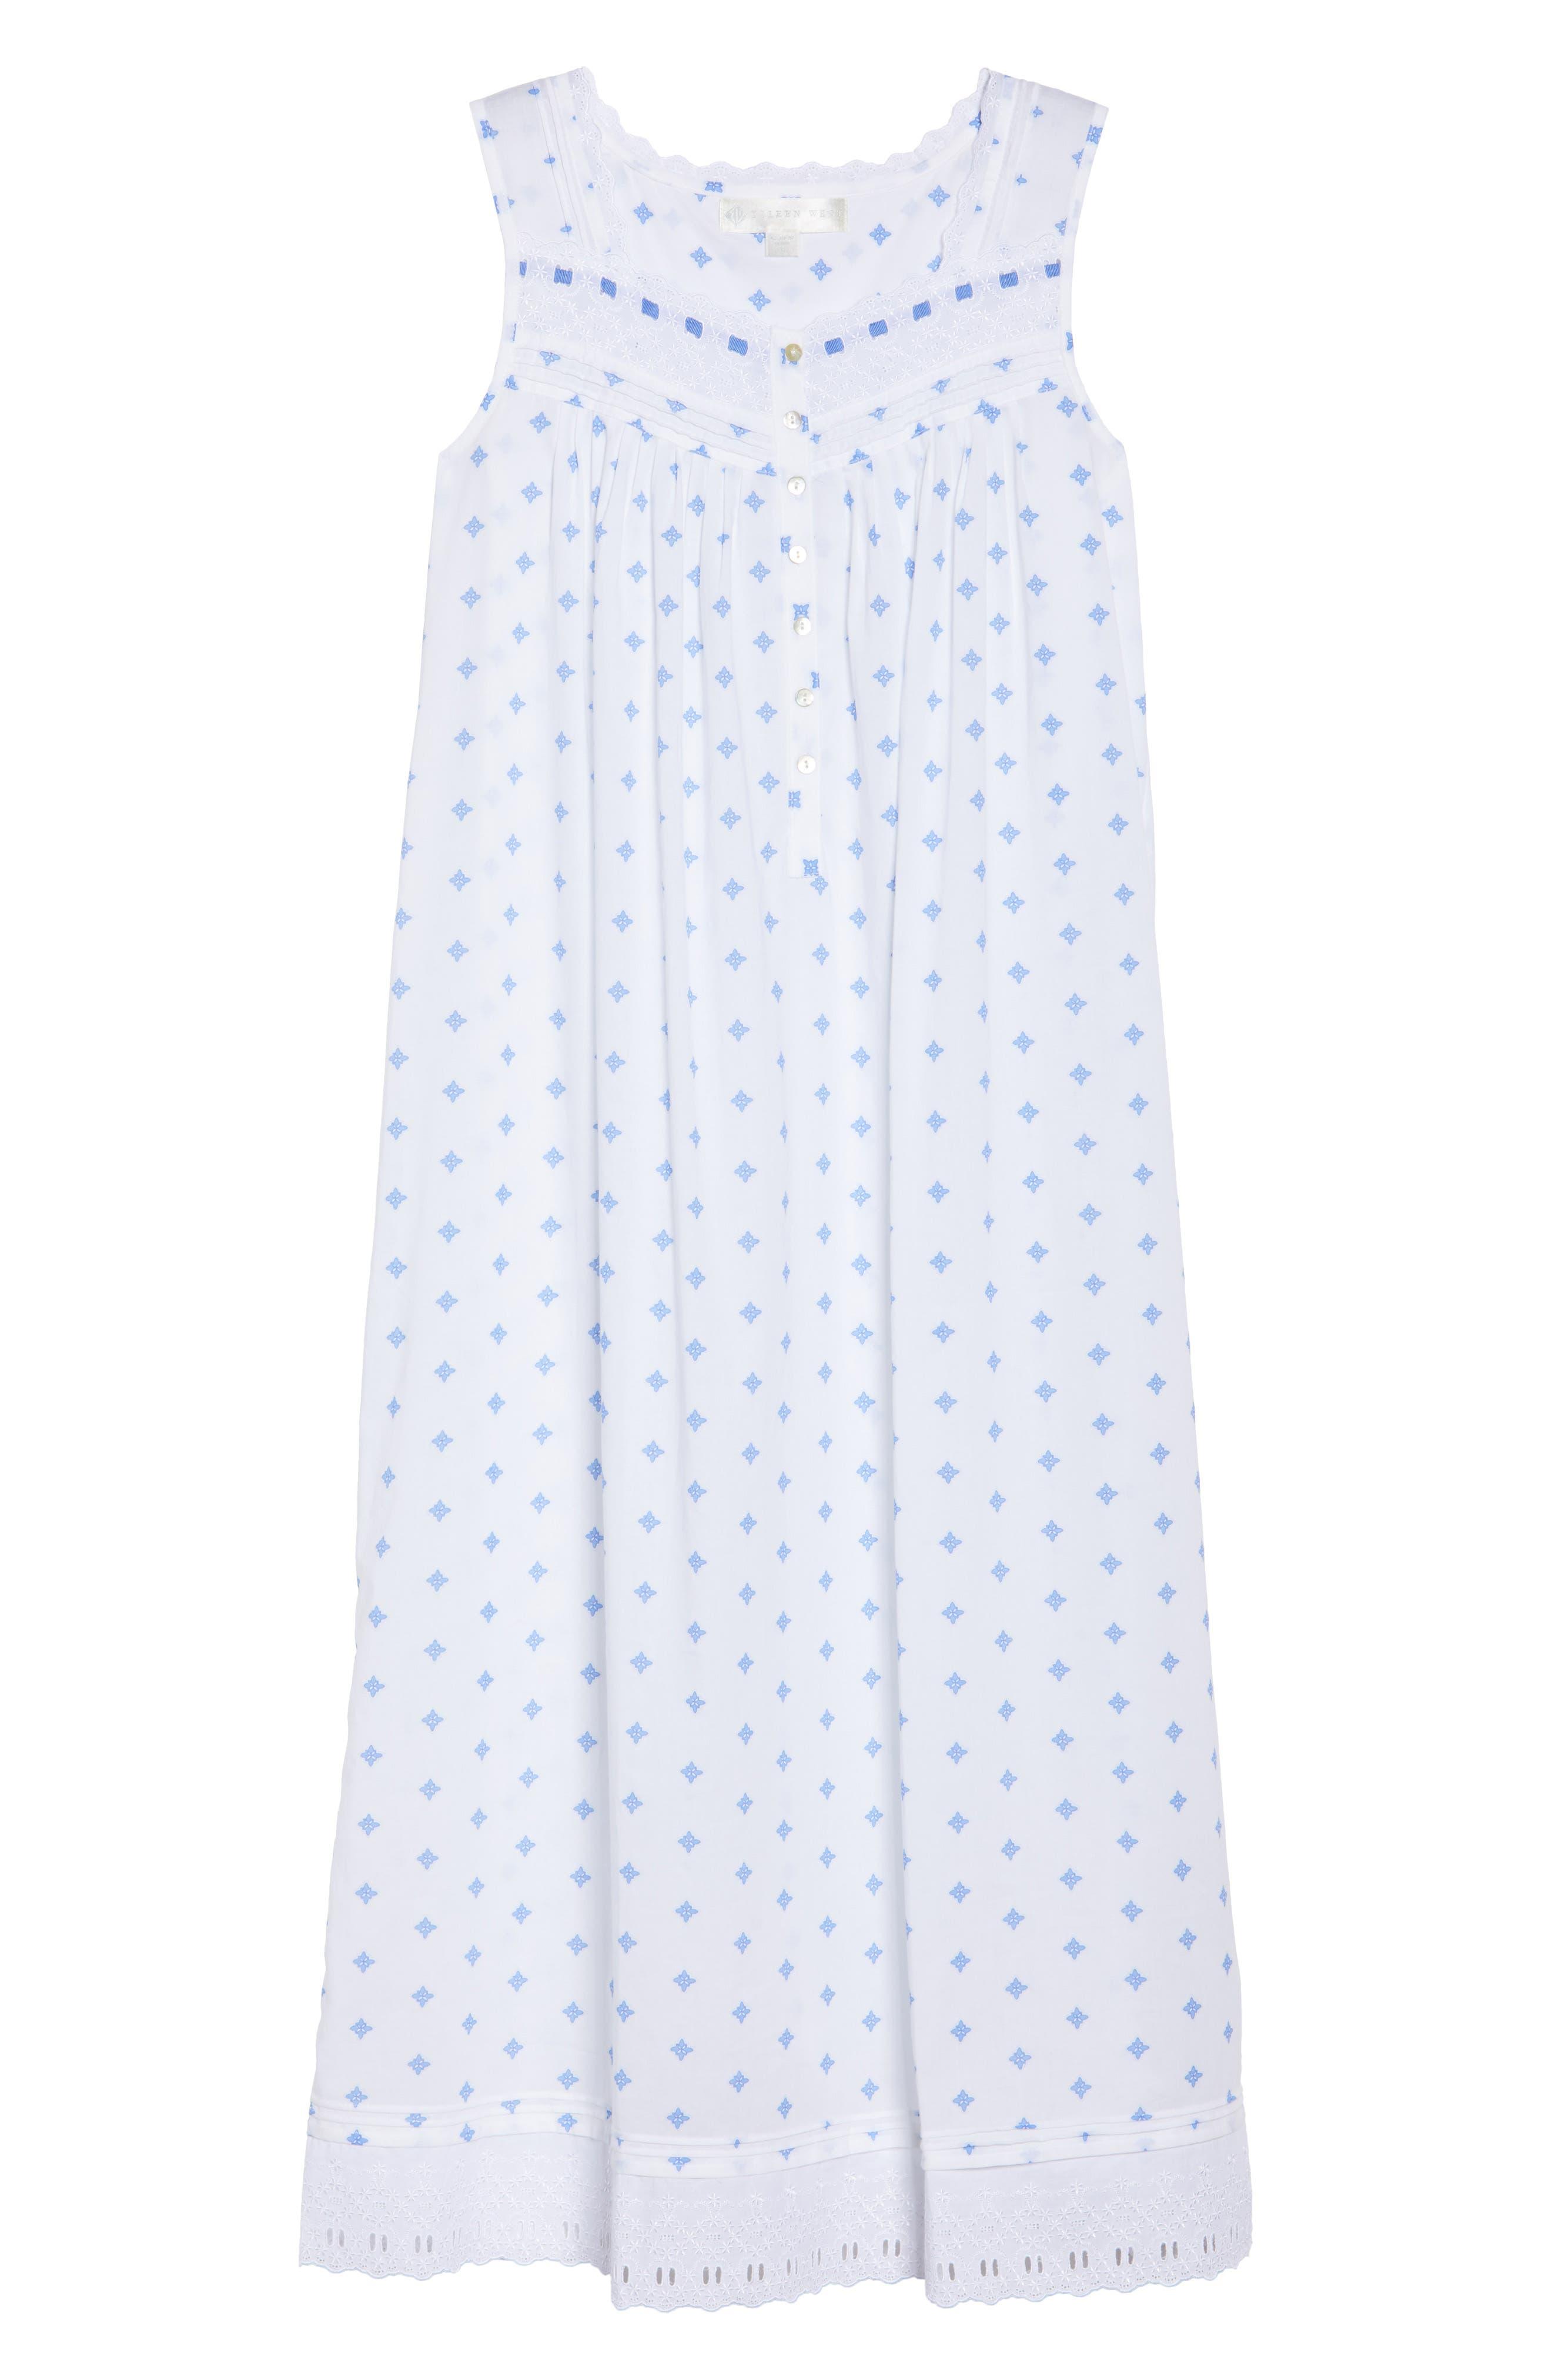 Ballet Nightgown,                             Alternate thumbnail 4, color,                             White Blue Geo